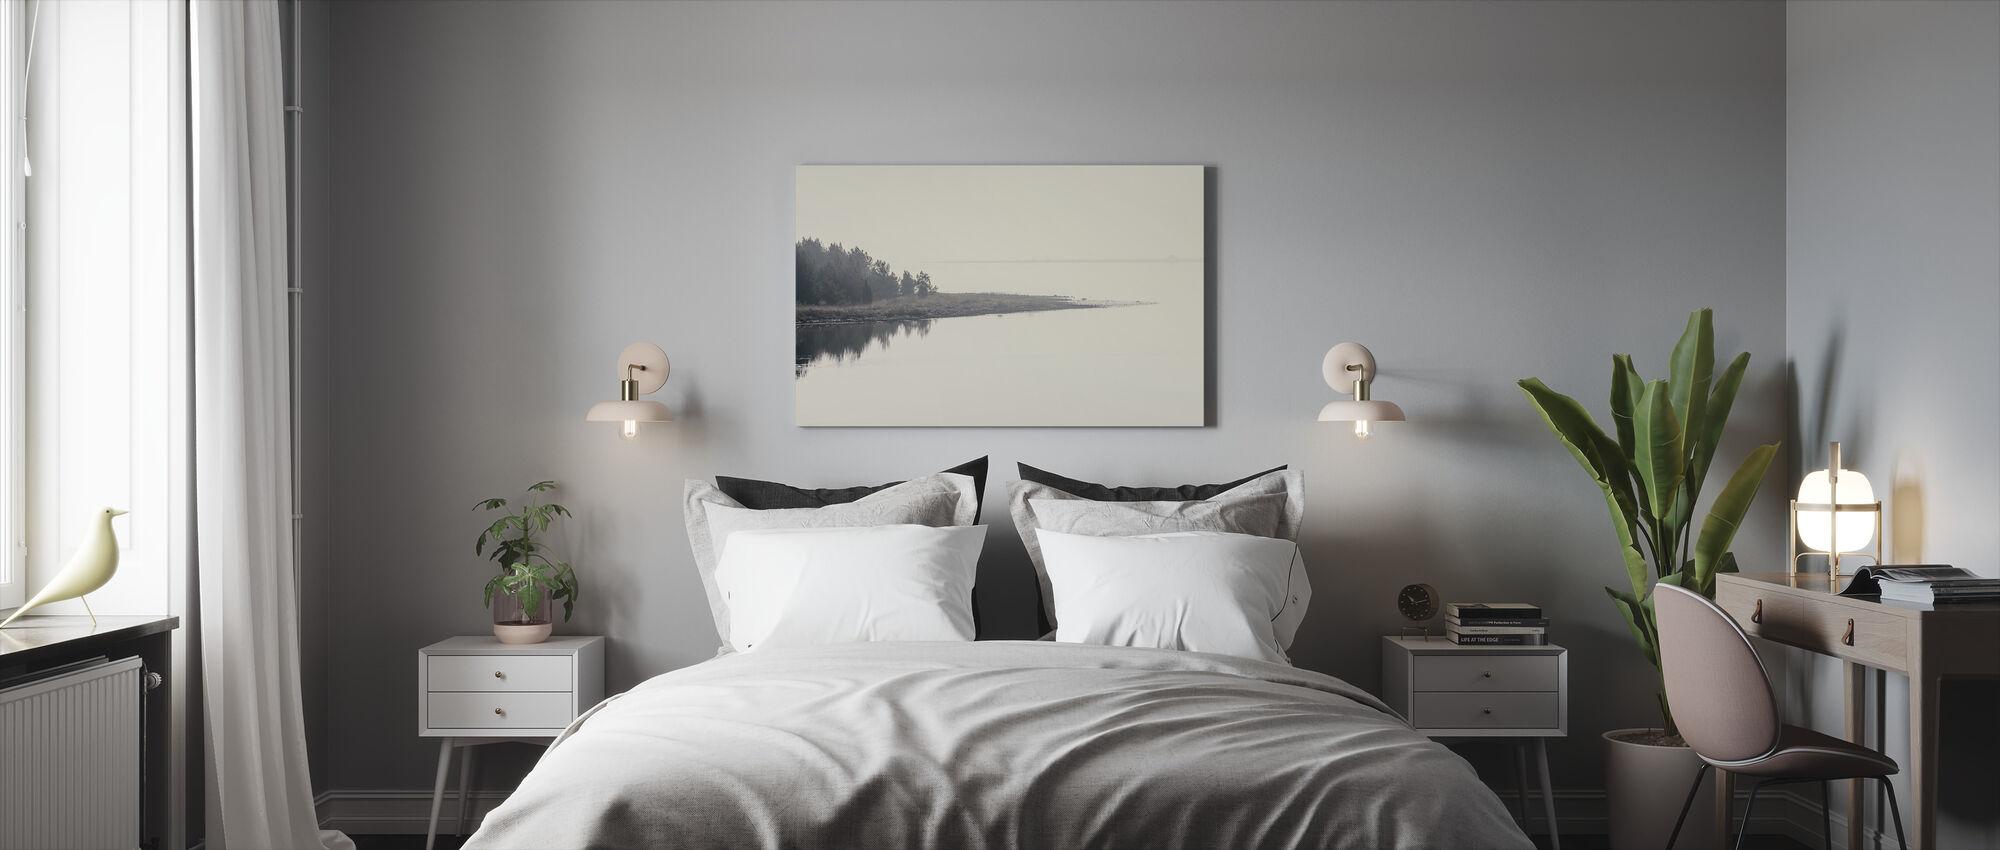 Serene Gotlanti - Canvastaulu - Makuuhuone